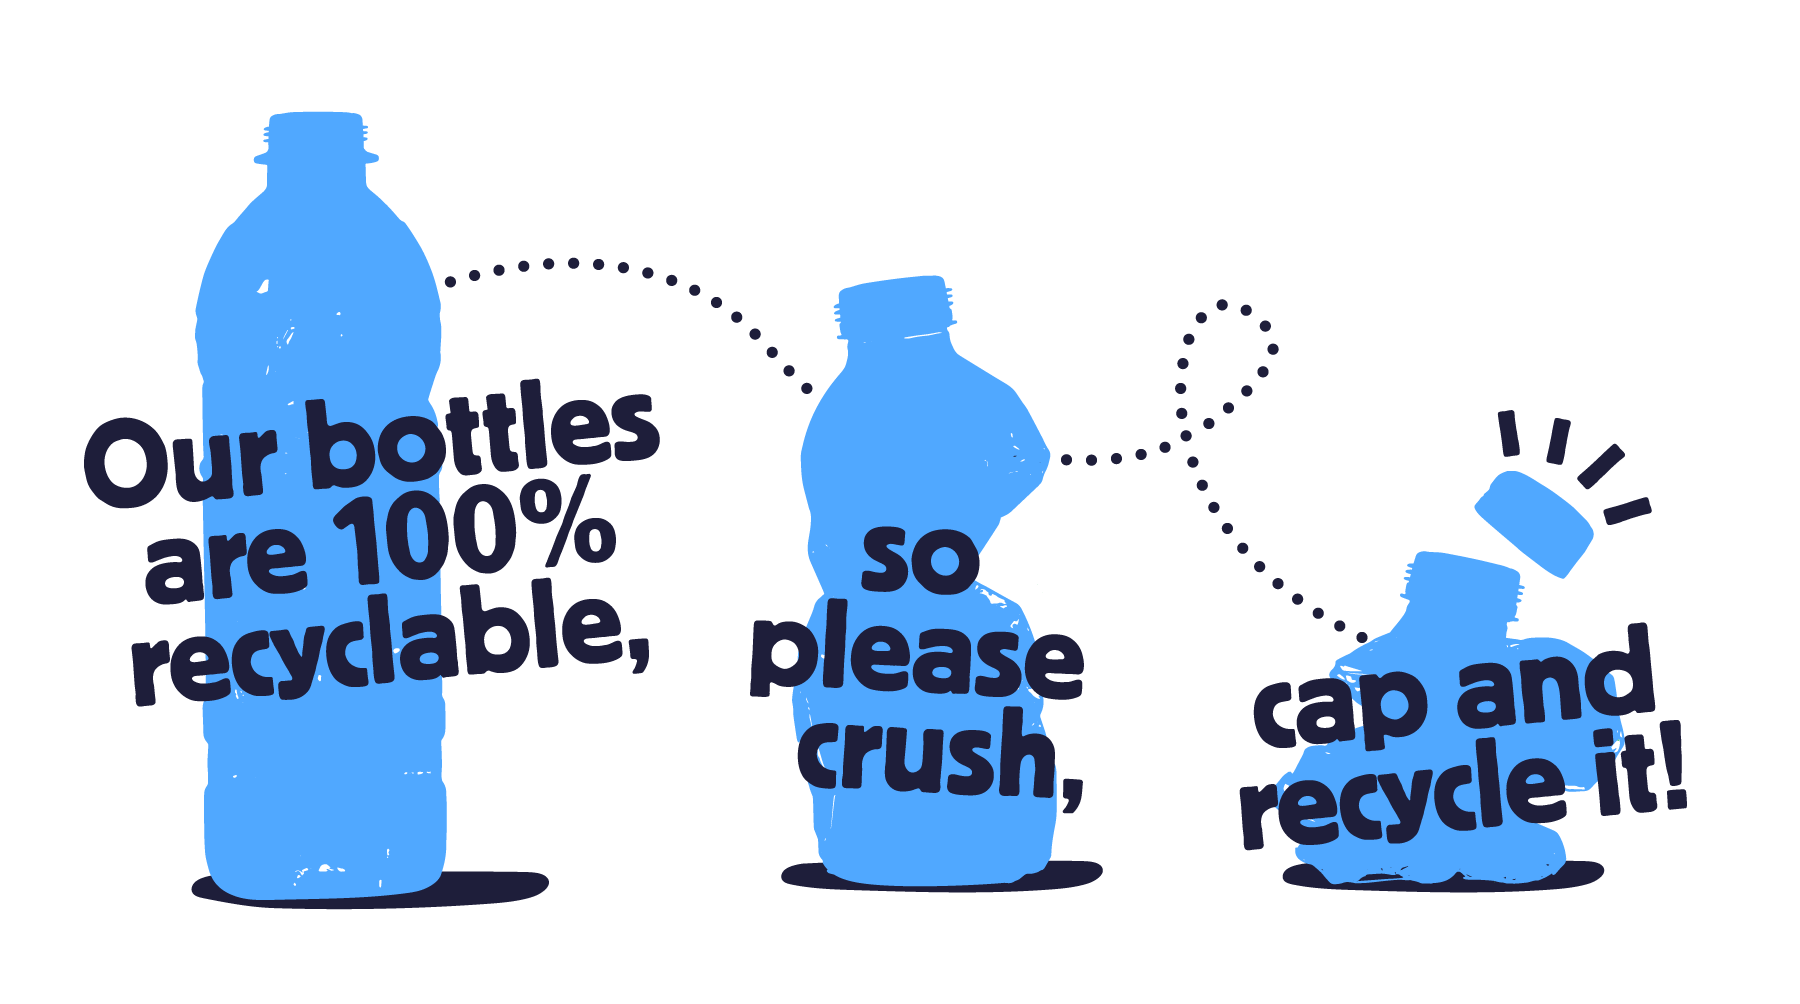 cap-it-recycle-it.png